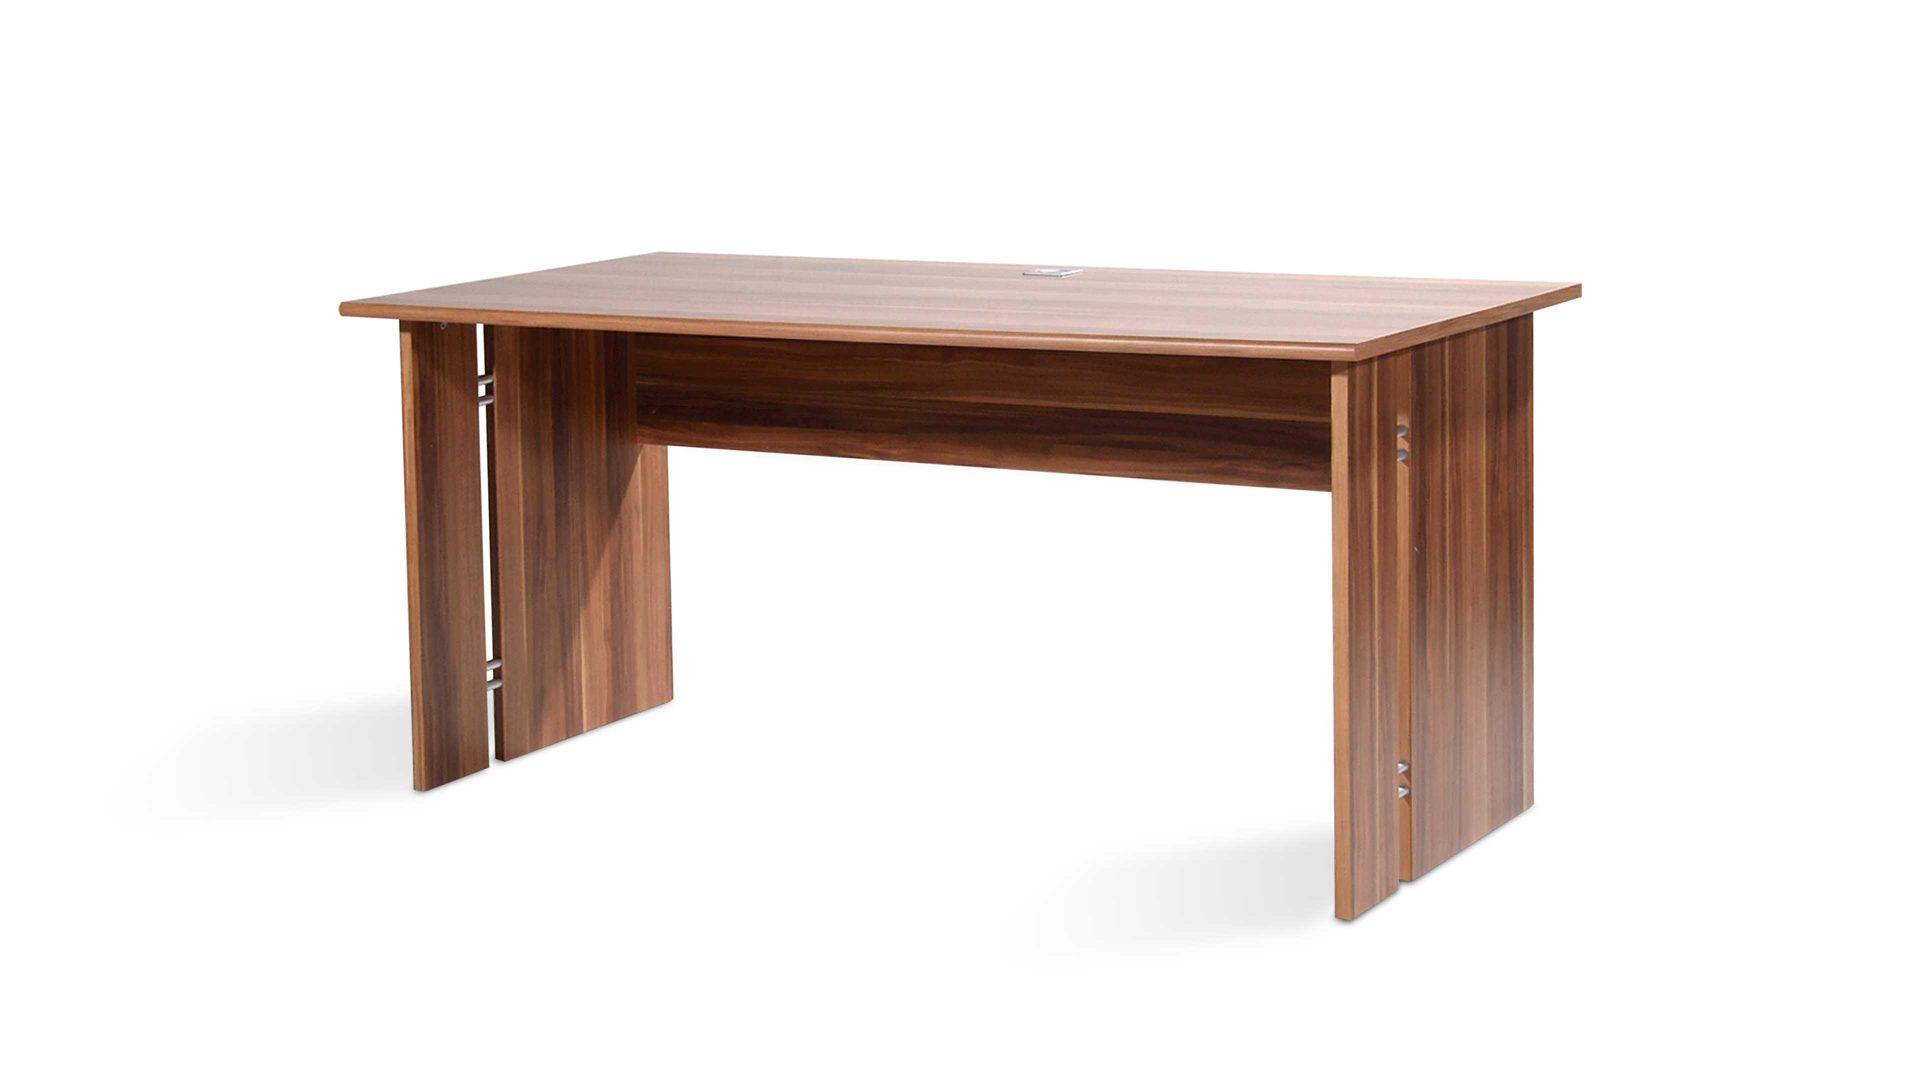 Möbel Hermes | Möbel A-Z | Büromöbel | Schreibtisch - Bürotisch ...